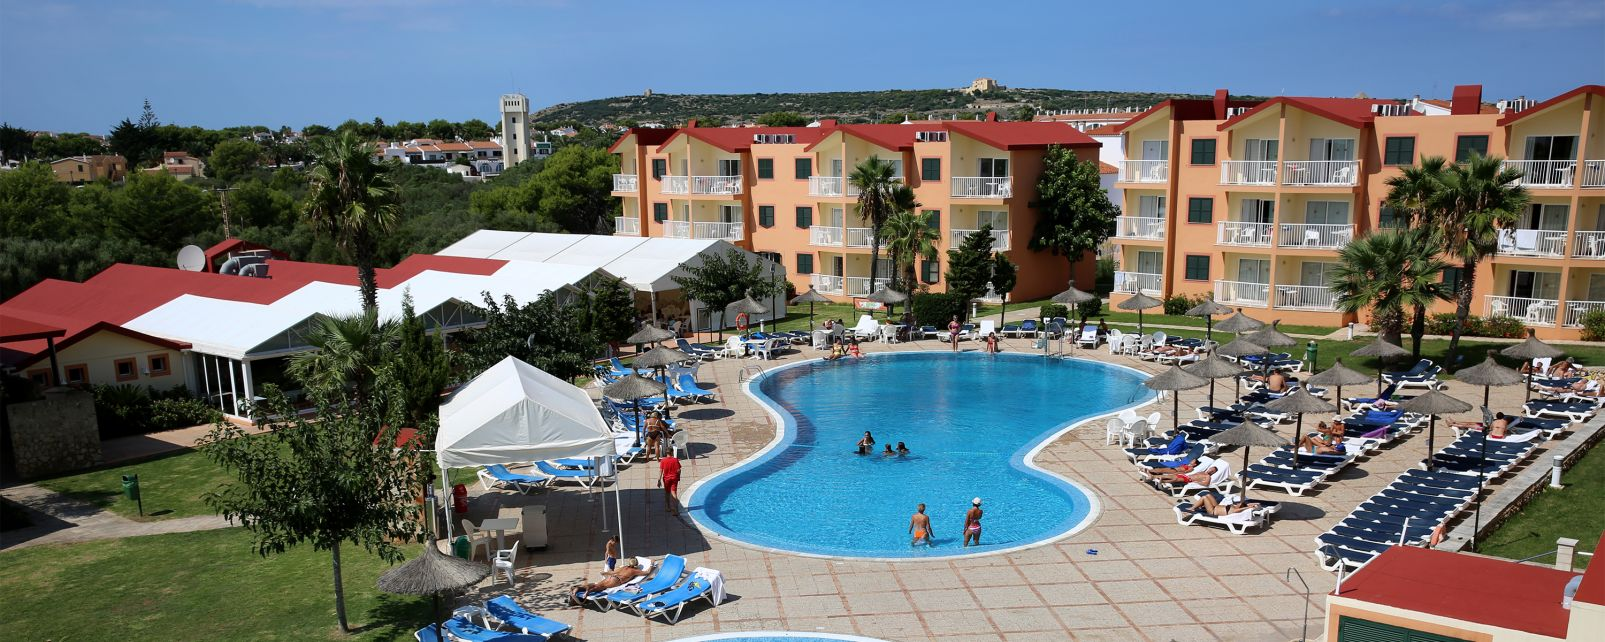 Hôtel Club Roc Cala'n Blanes Beach